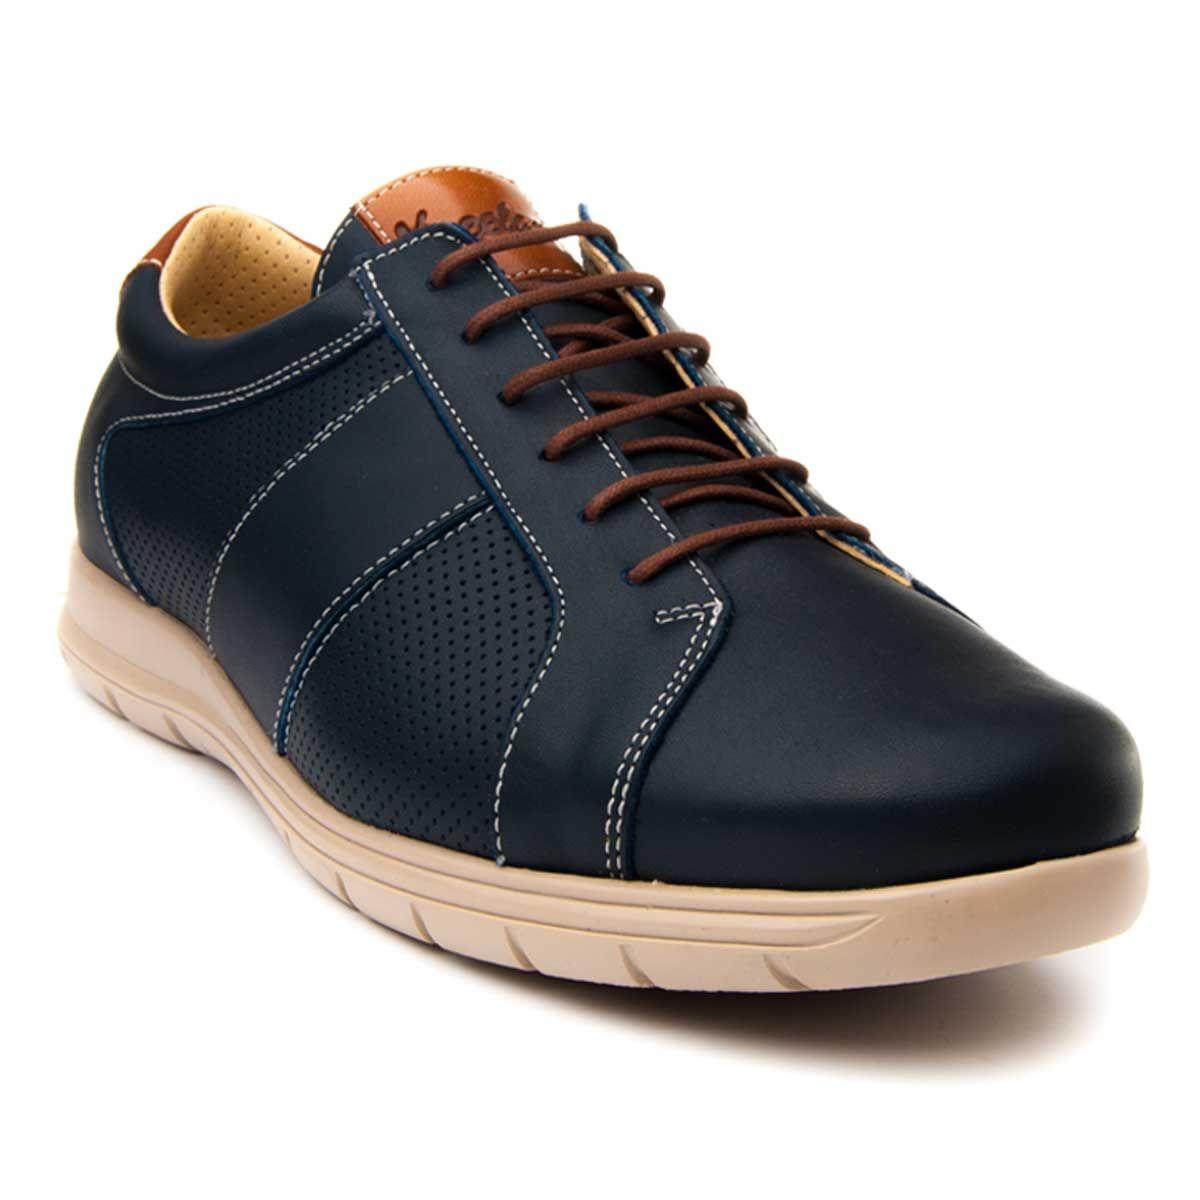 Purapiel Cleated Sole Sneaker in Blue